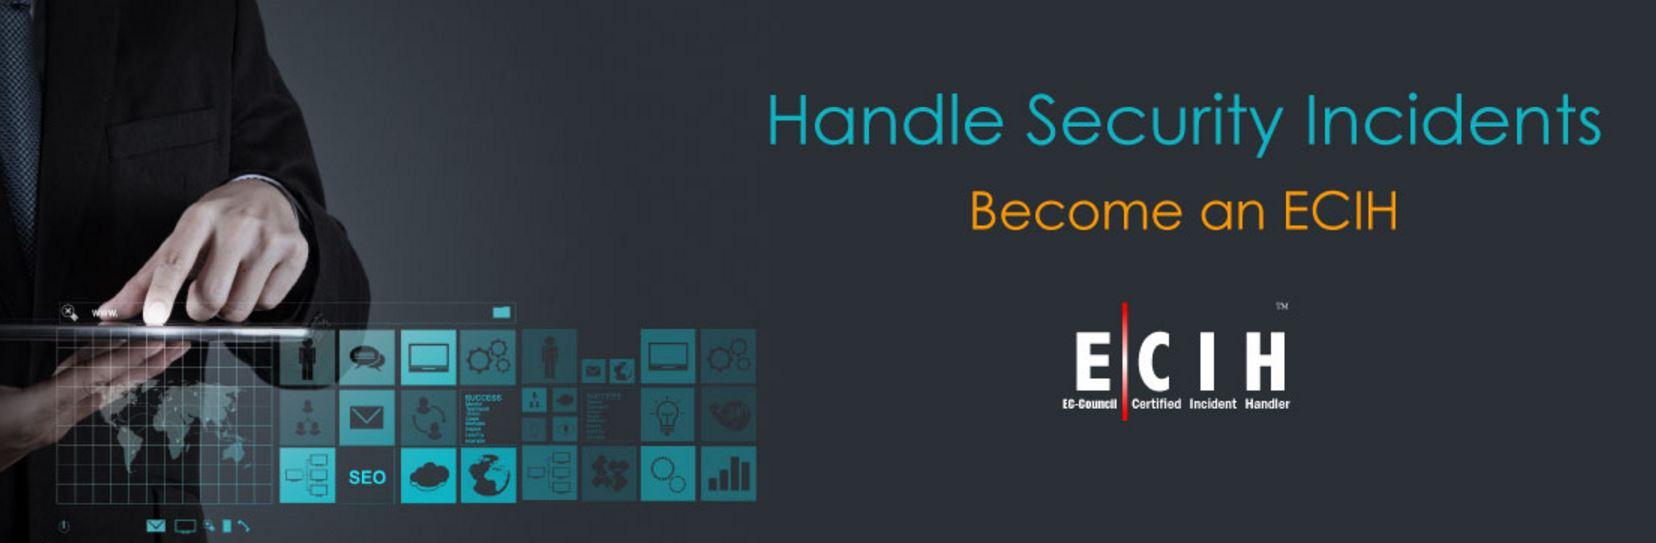 Ec Council Certified Incident Handler Ecih Acinfotec